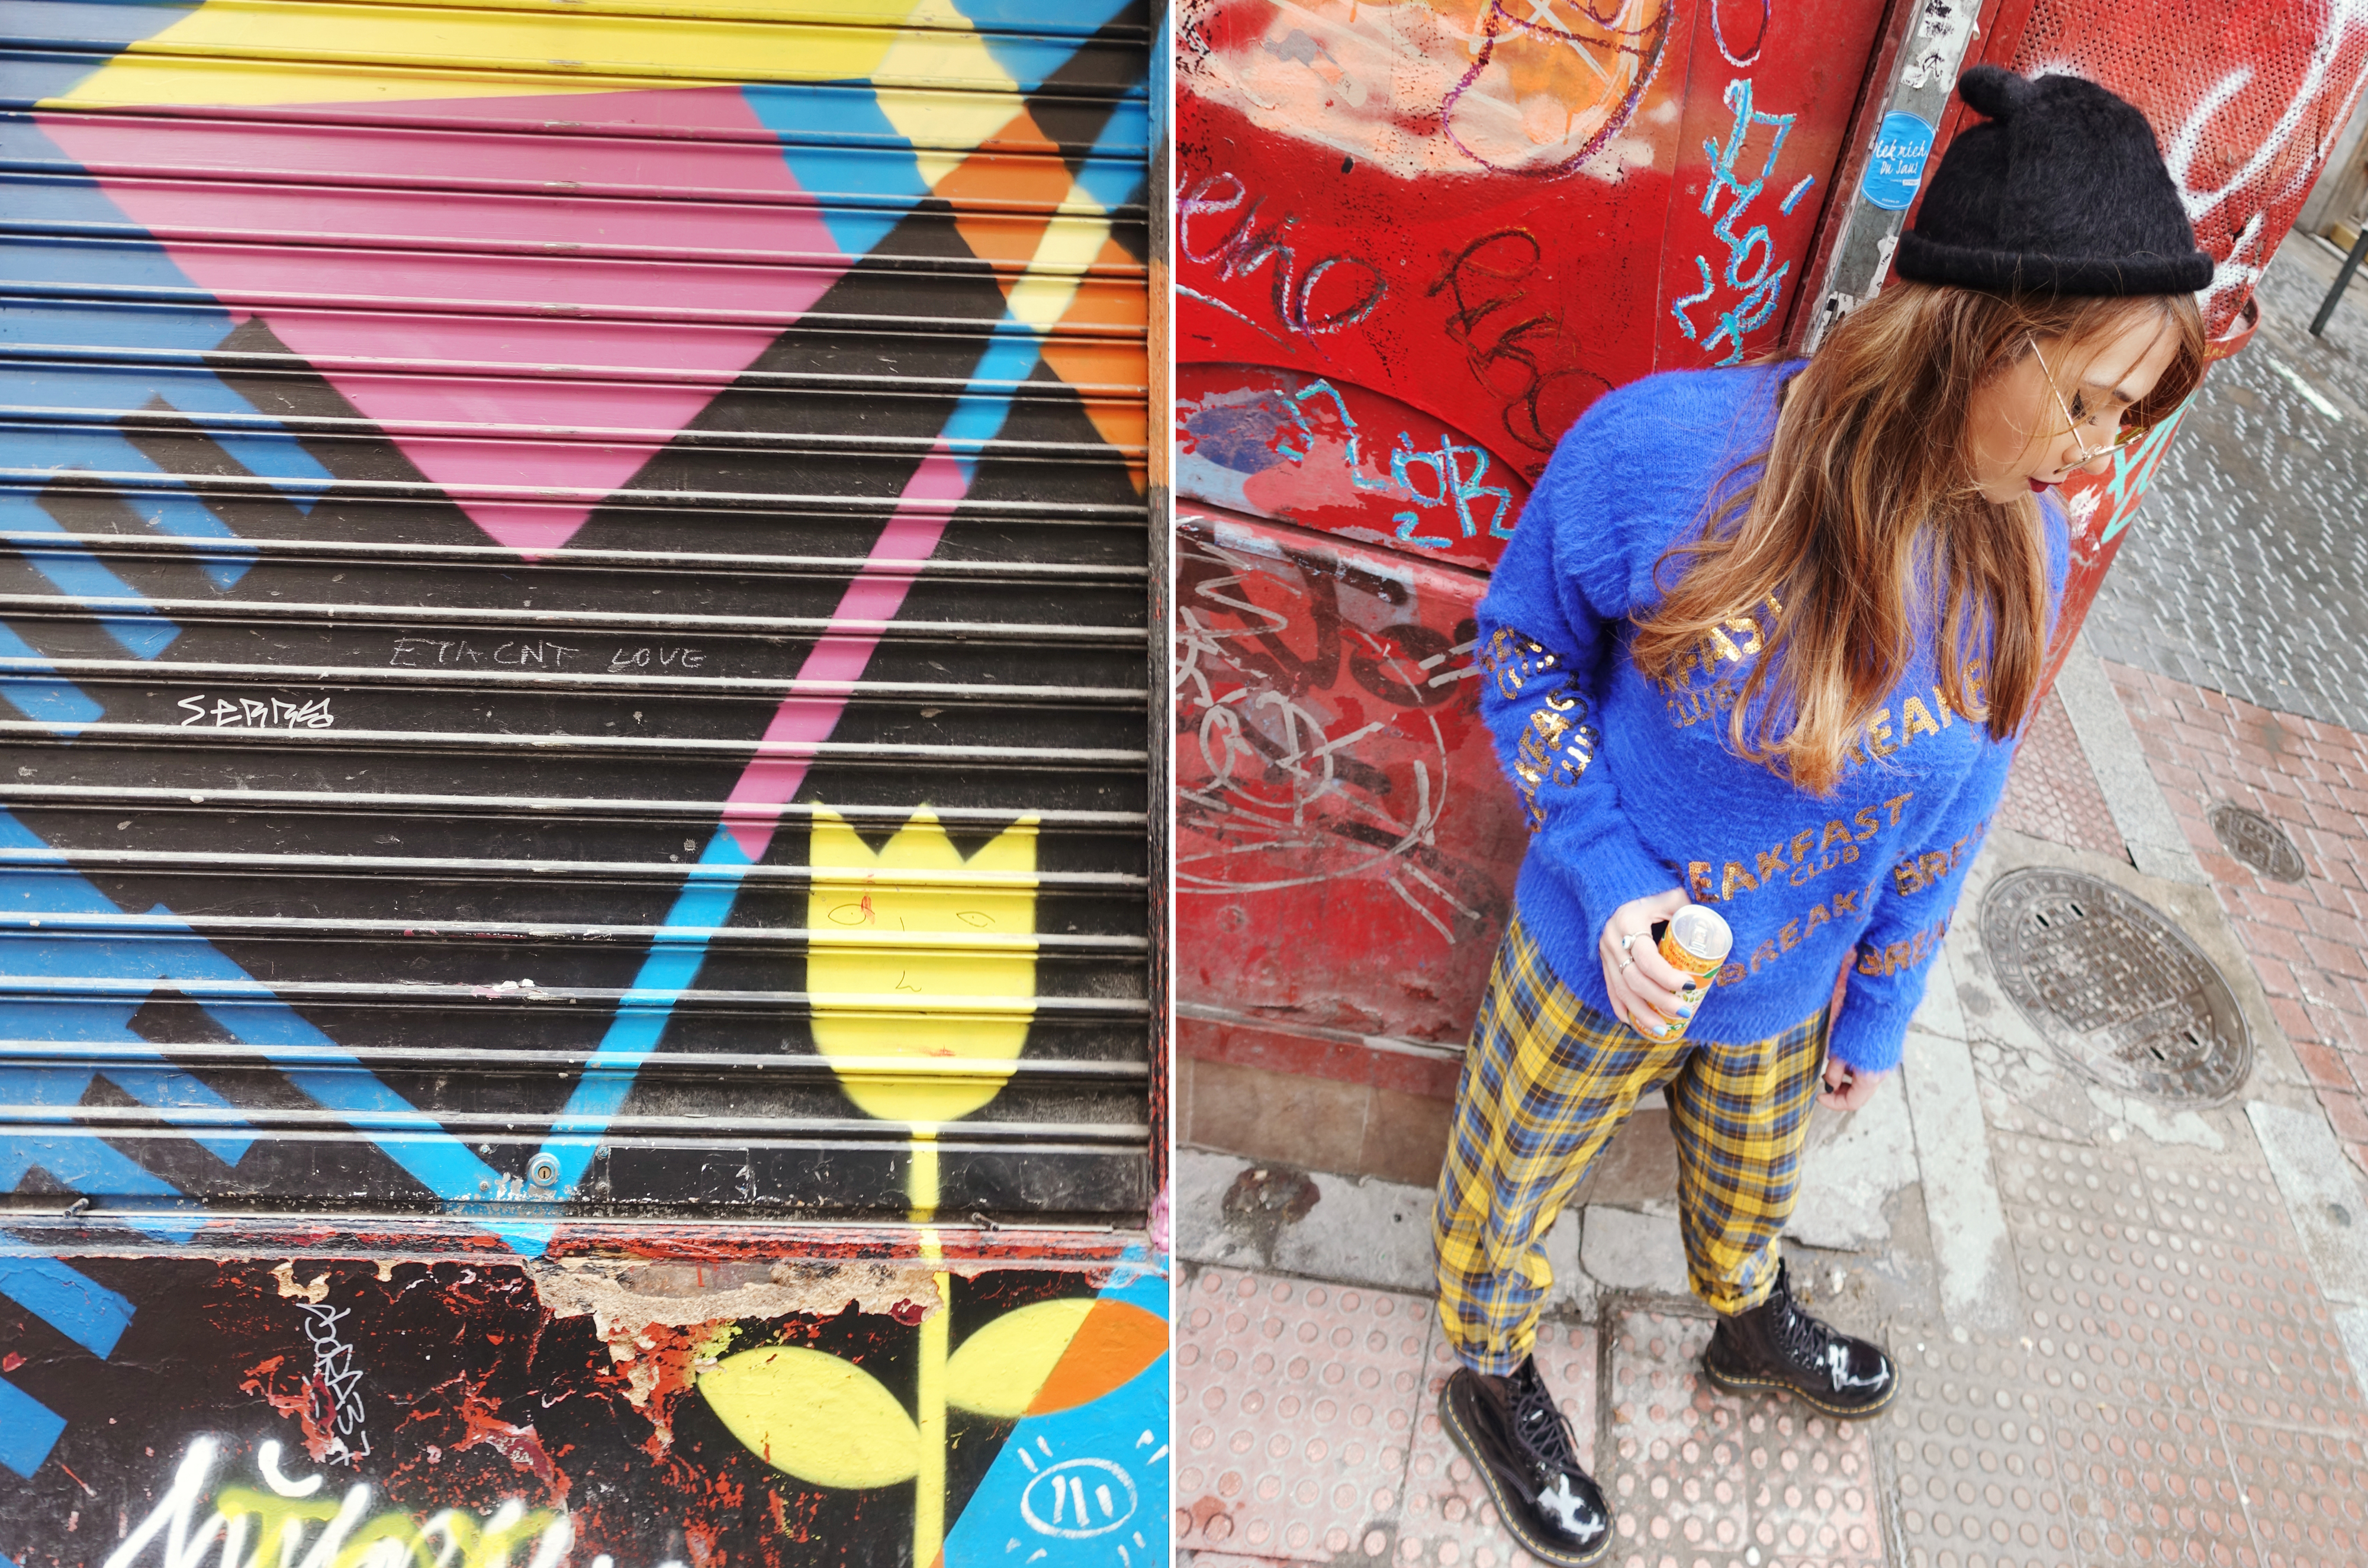 Blog-de-moda-Chicadicta-influencer-Piensaenchic-hipster-look-sweater-drmartens-style-mollybracken-chic-adicta-Piensa-en-Chic